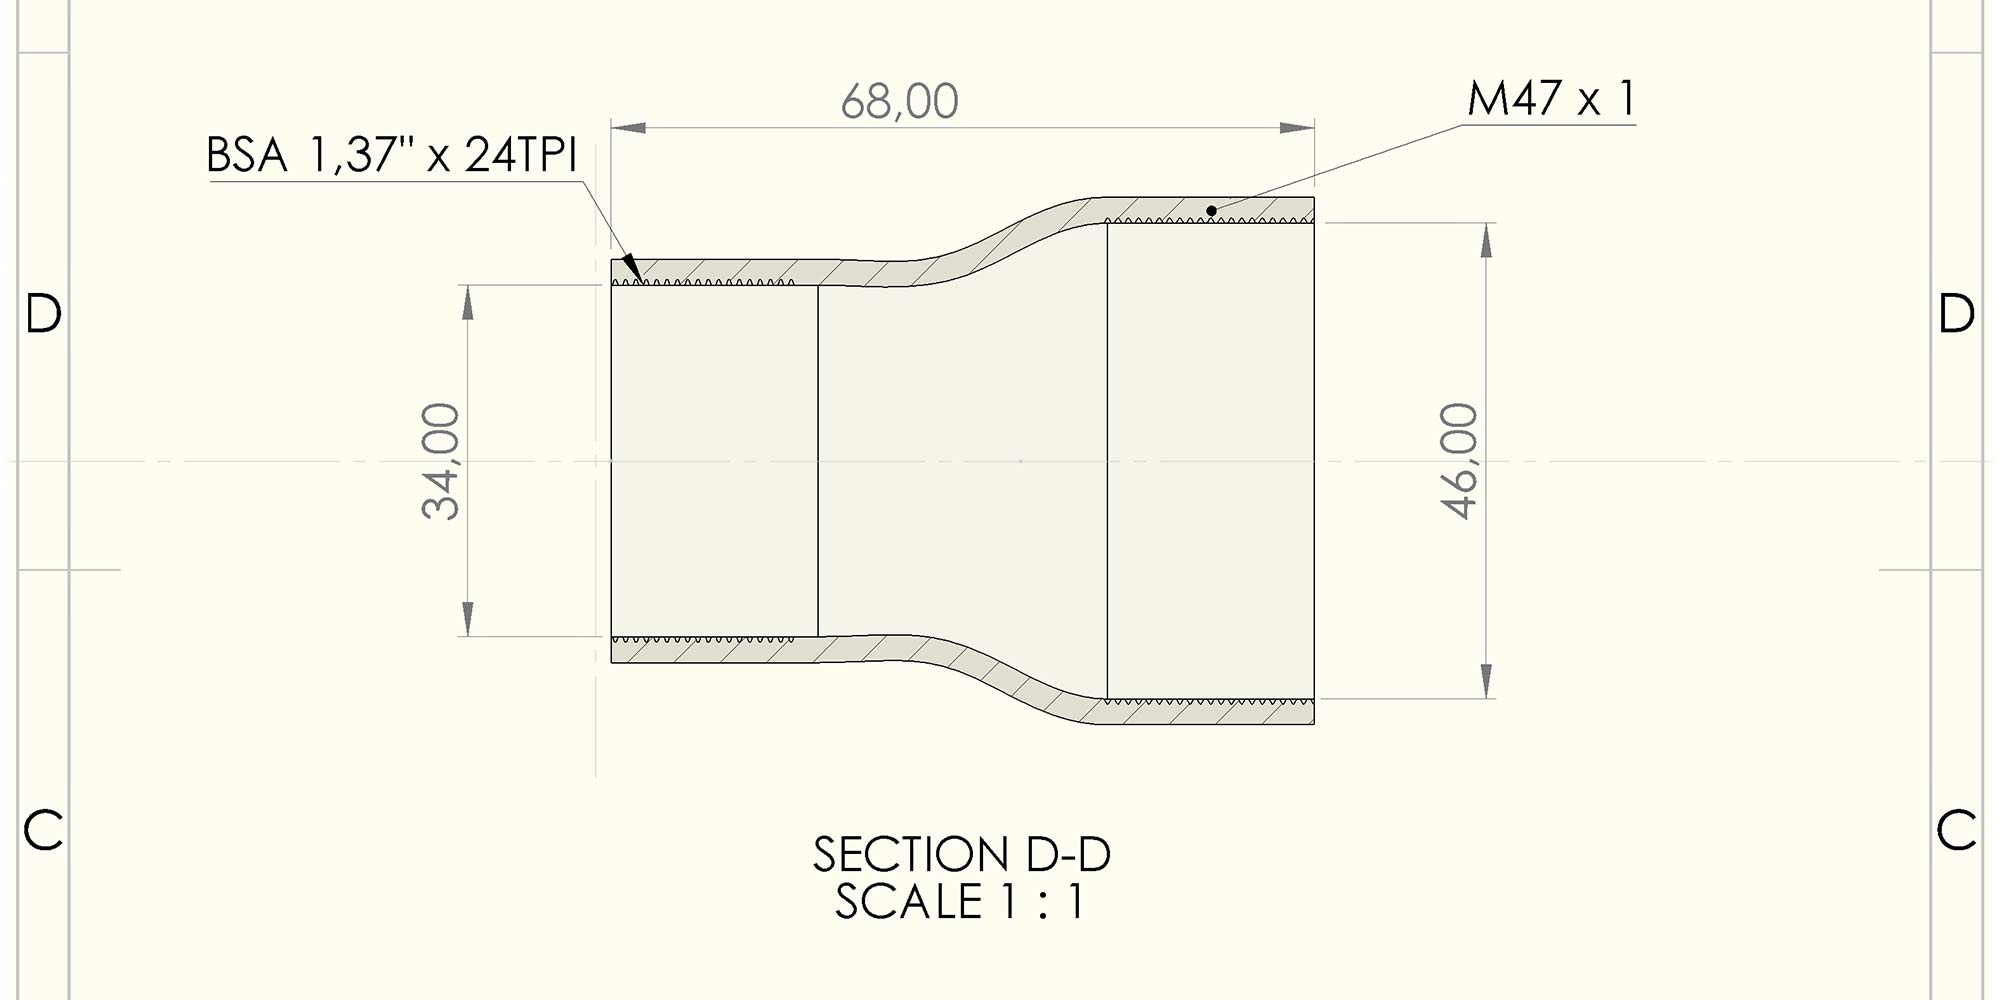 Bombtrack BSA-47 BB, new threaded bottom bracket standard concept, open standard dimensions